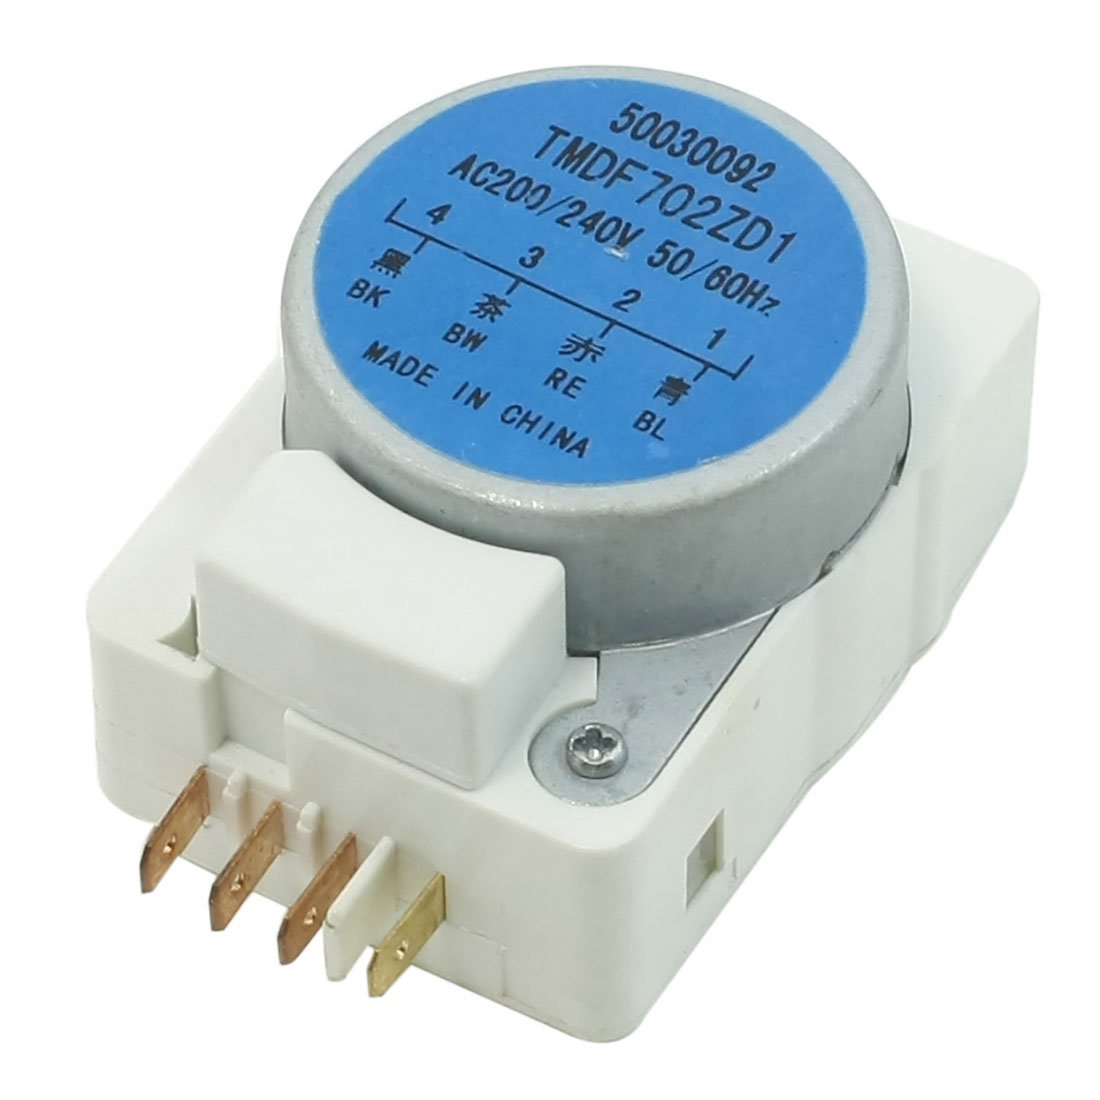 AC 200/240V 50/60Hz 4 Terminals Refrigerator Defrost Timer TMDF702ZD1